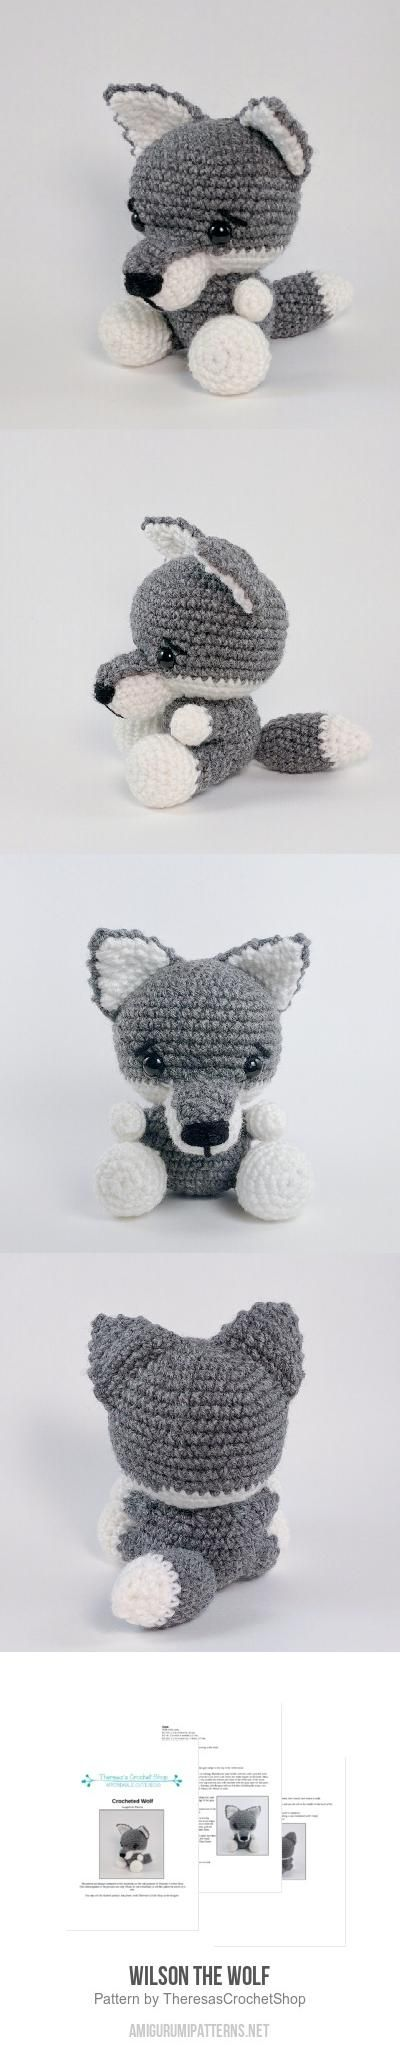 Amigurumi Crochet Stitches : Best 20+ Wolf craft ideas on Pinterest Gingerbread man ...